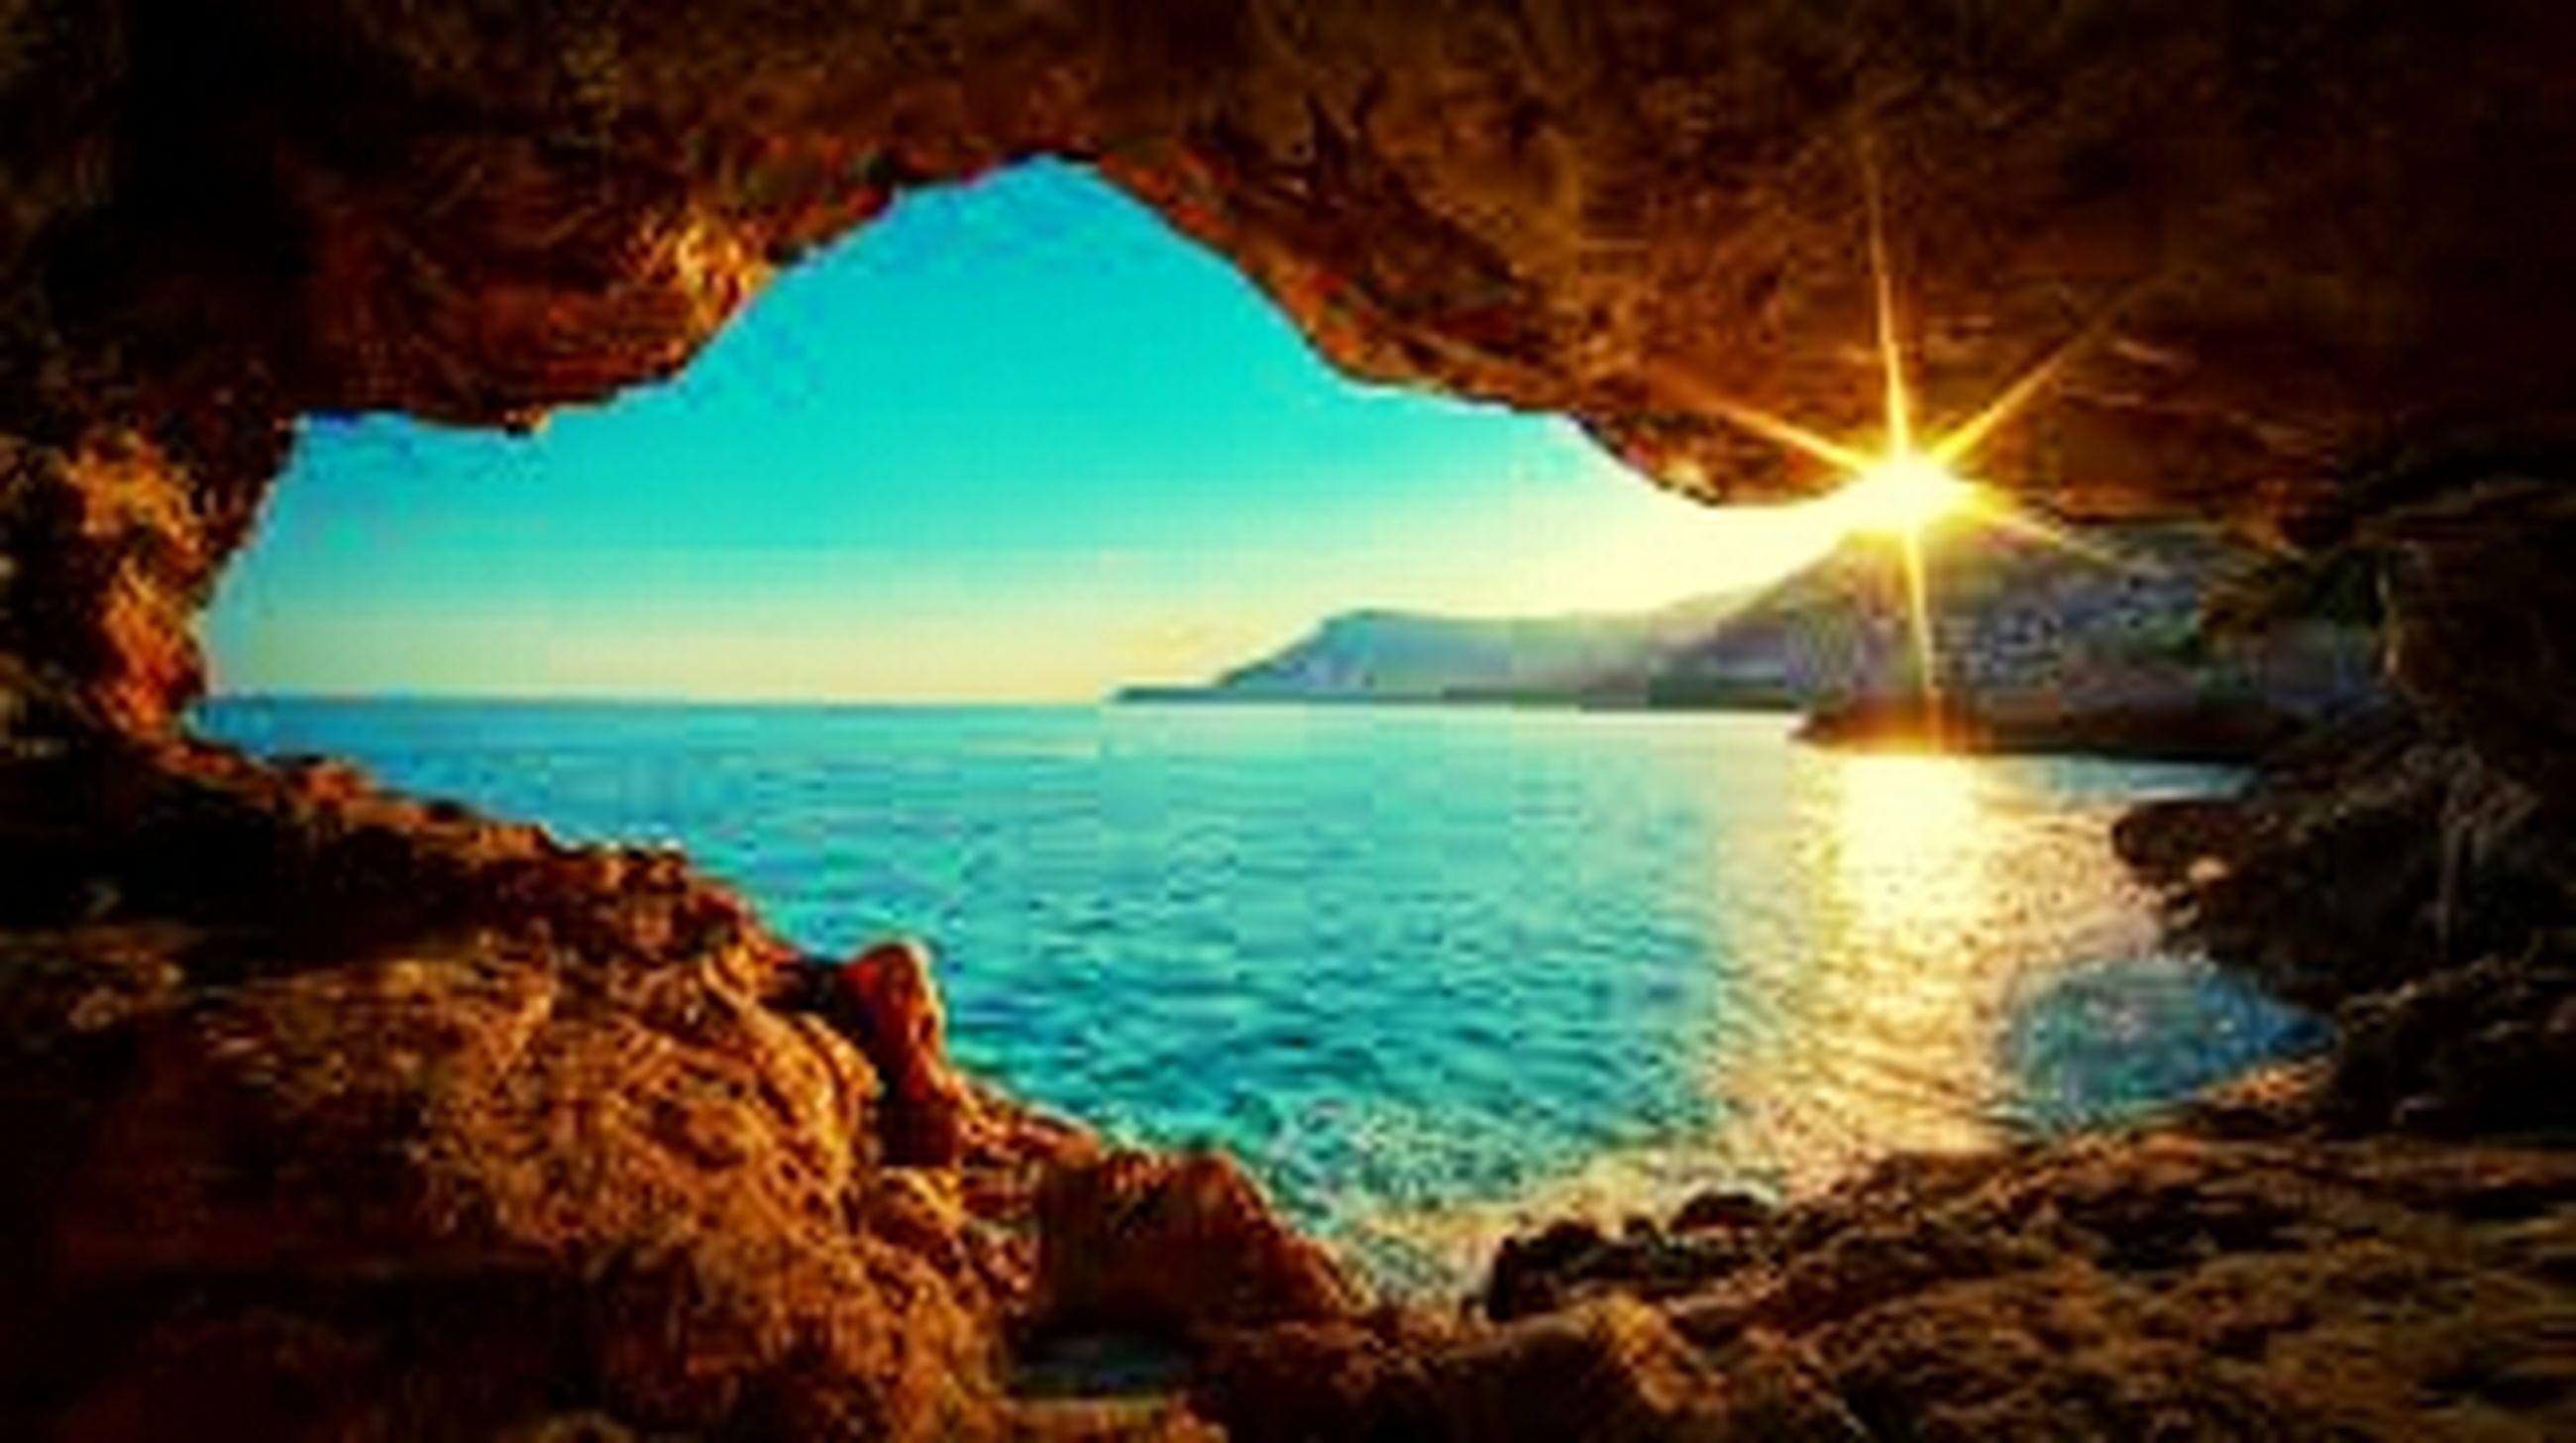 sea, water, scenics, tranquil scene, horizon over water, tranquility, beauty in nature, sun, sky, nature, rock - object, idyllic, sunlight, rock formation, beach, reflection, sunbeam, blue, mountain, shore